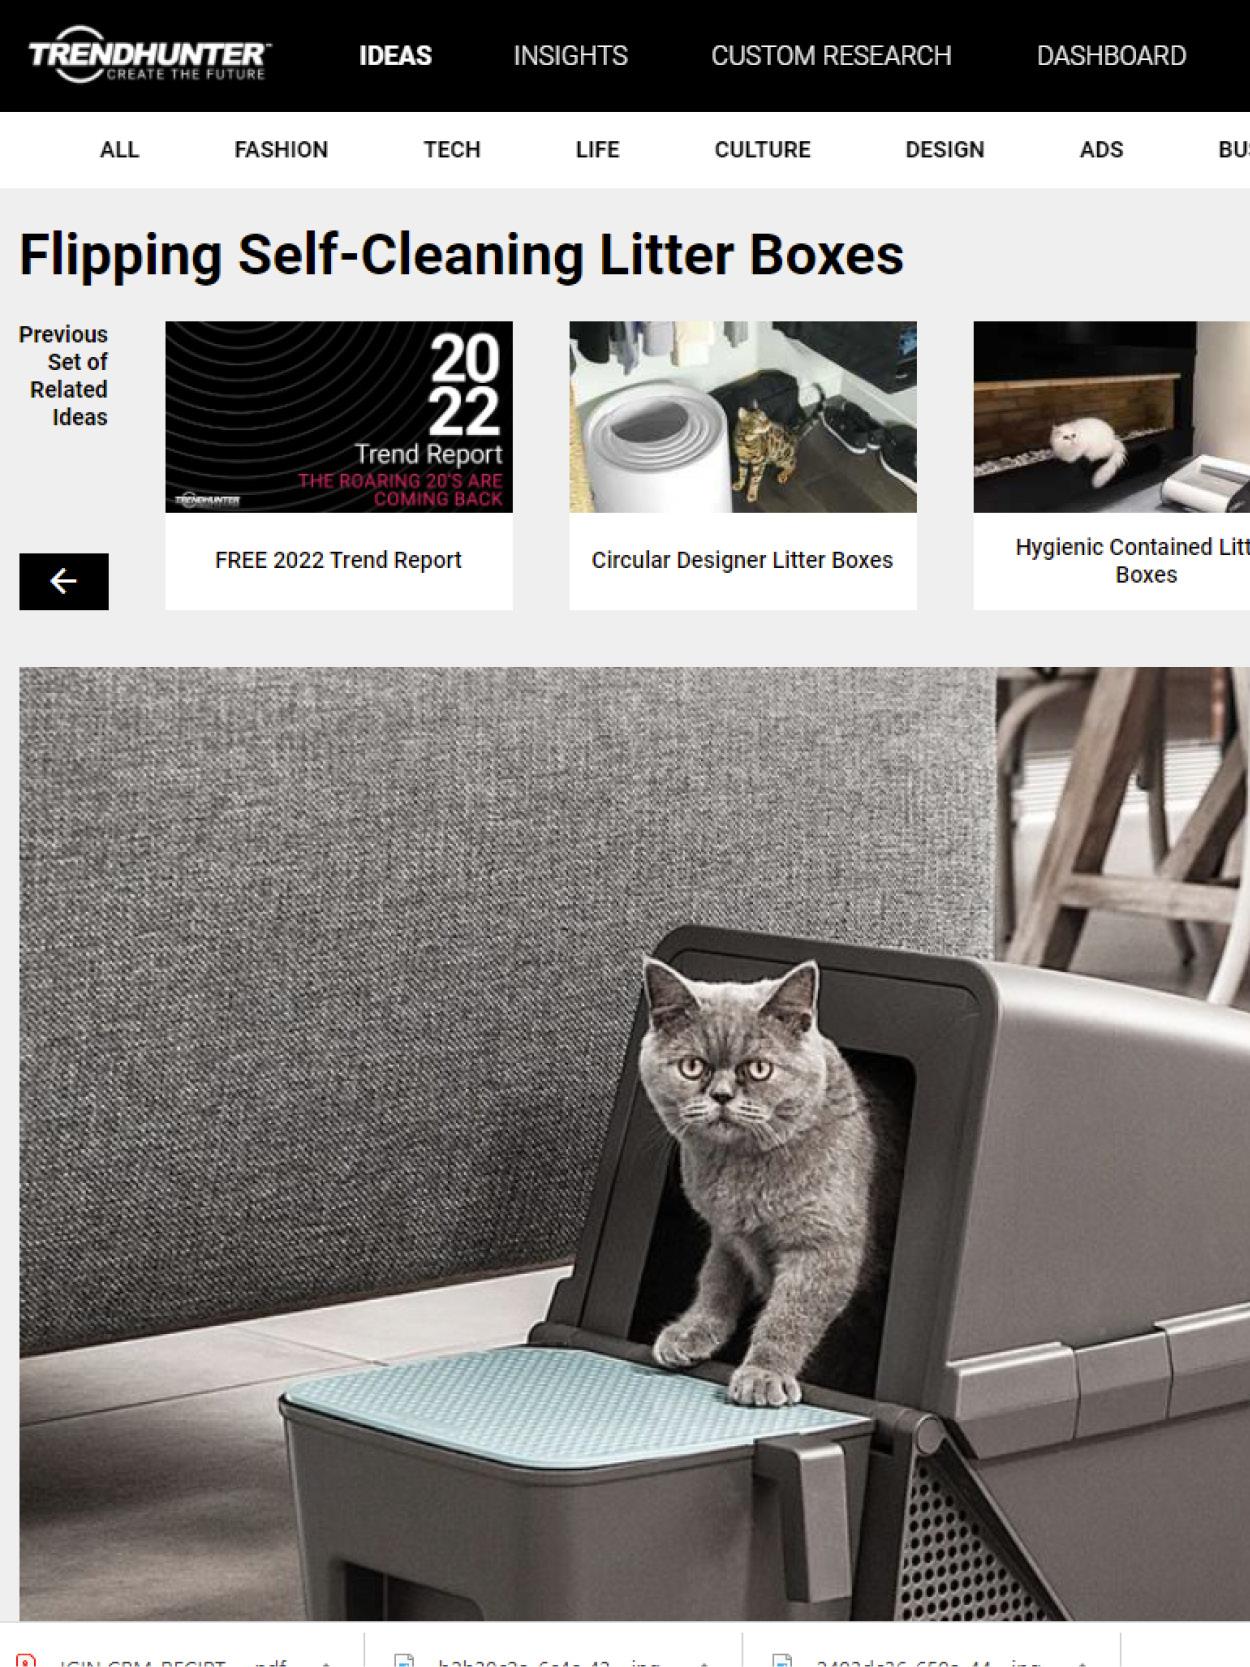 litter box design, Industrial design, product design